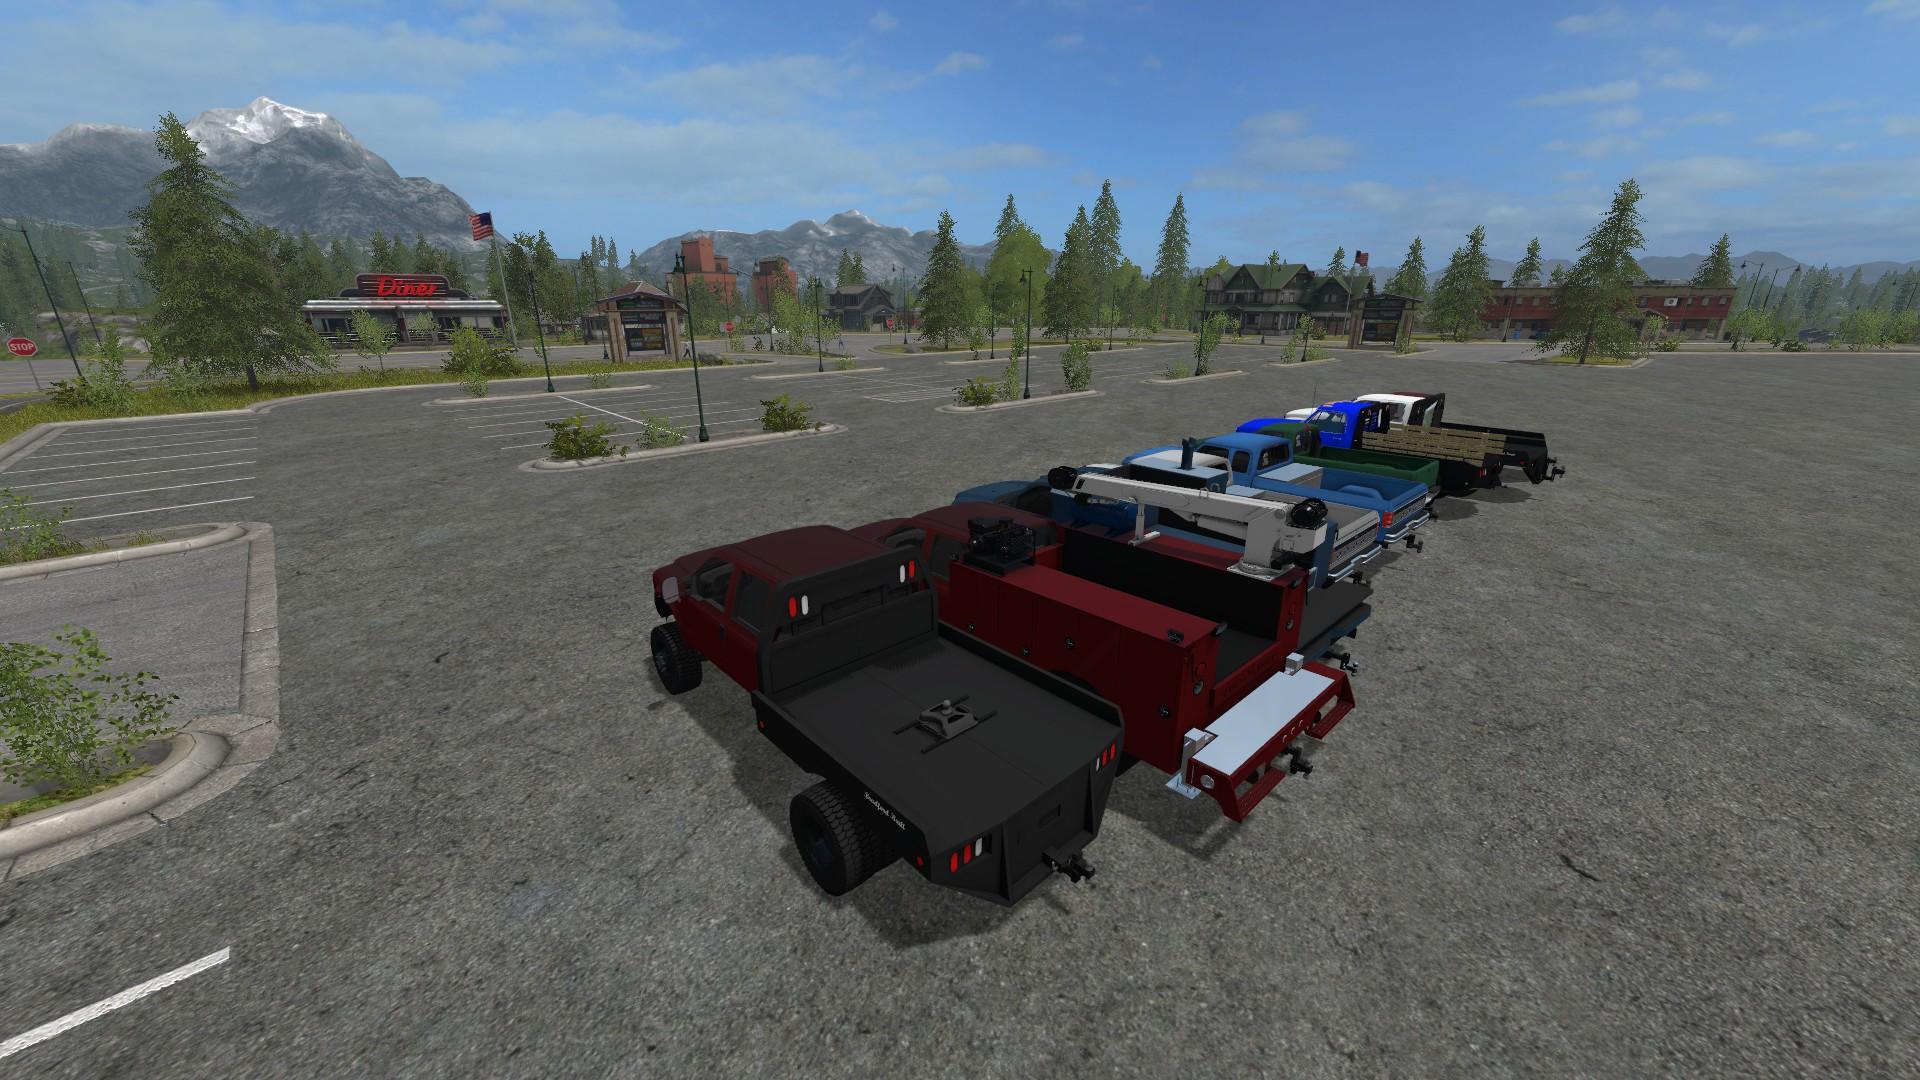 2017 Dodge Dually >> DODGE FORD PACK V1.0 FS17 - Farming Simulator 17 mod / FS 2017 mod